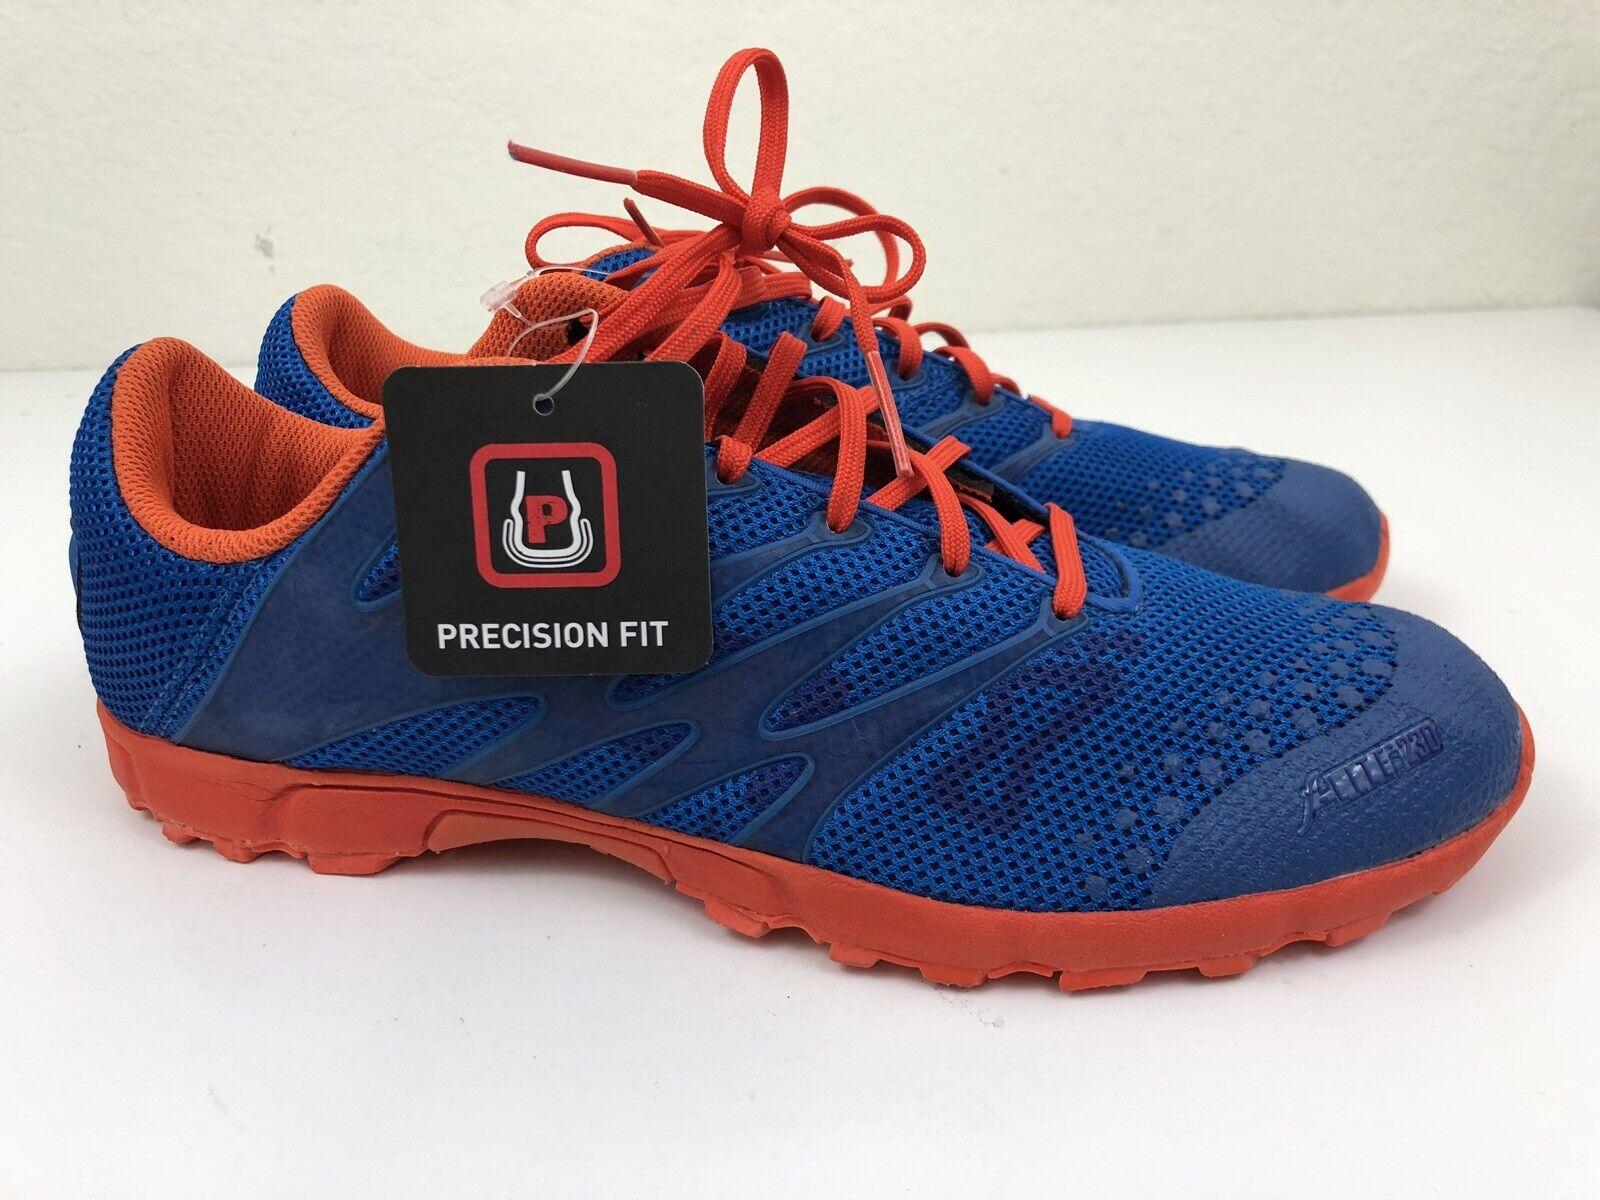 Inov - 8 F-Lite 230 Para Hombre Calce Crossfit Running Zapatos Talla Precision Talle Us 10 Azul